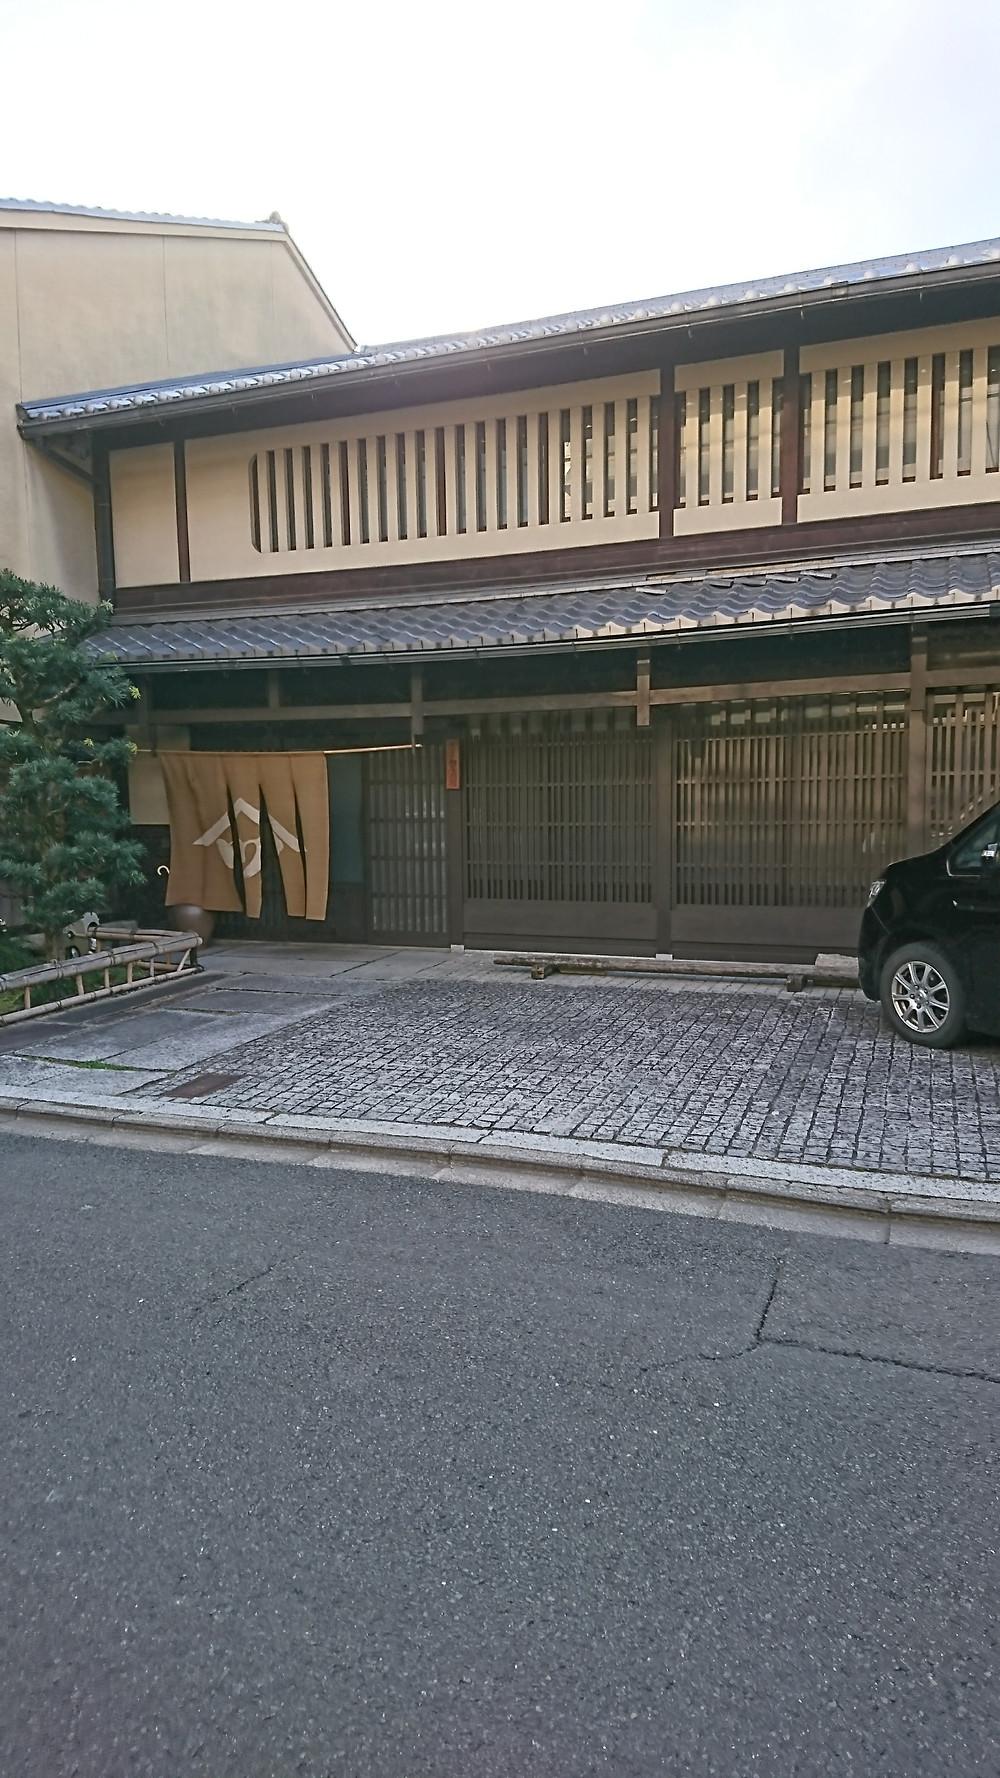 株式会社 細尾 house of hosoo